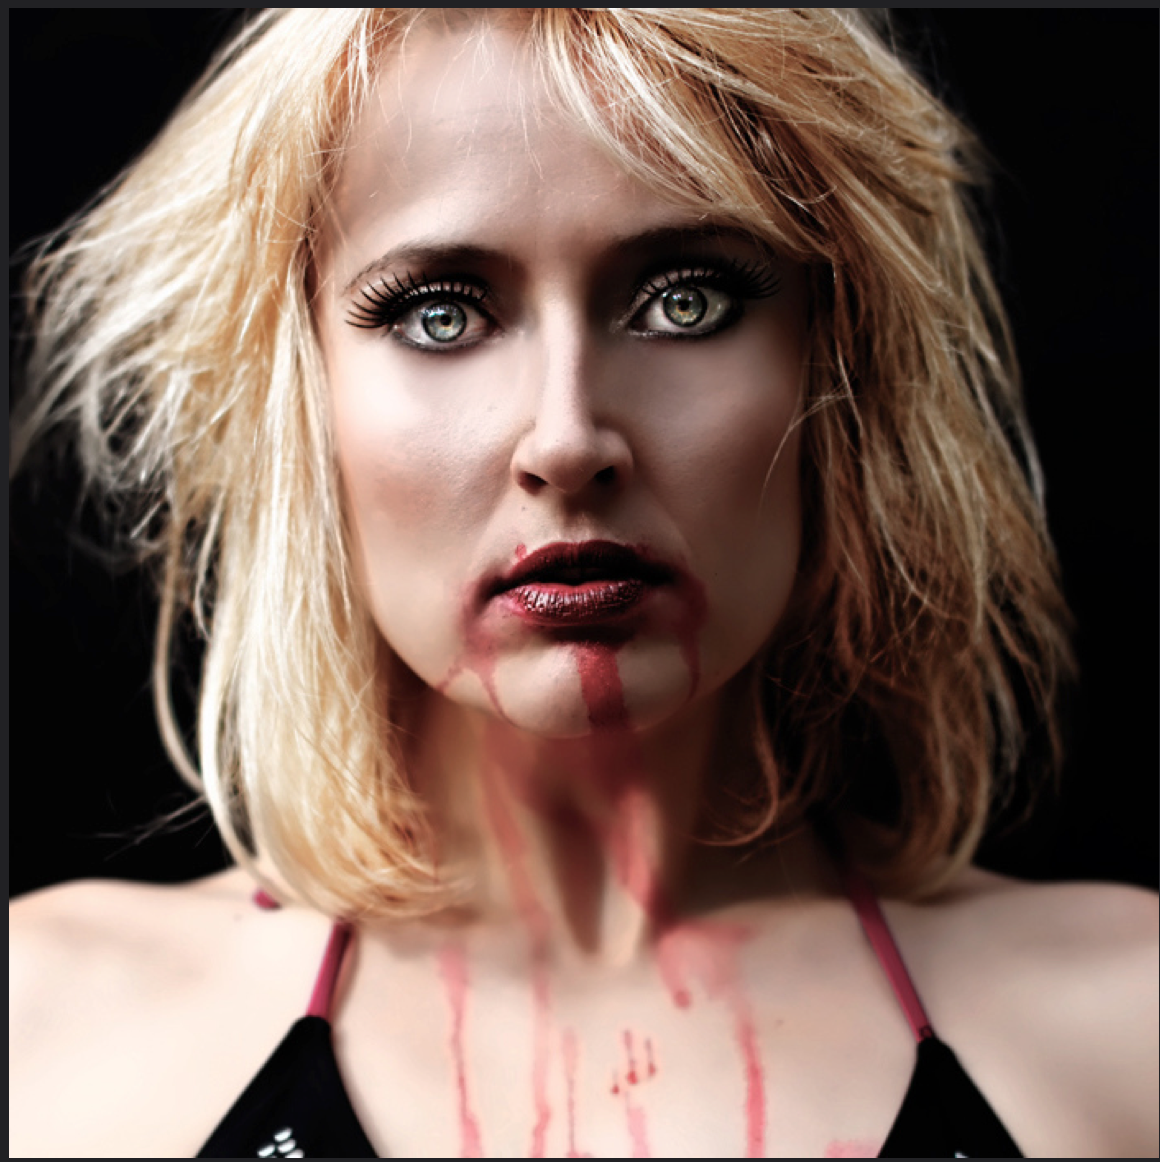 The disturbing horror portraits of Danielle Tunstall (NSFW)